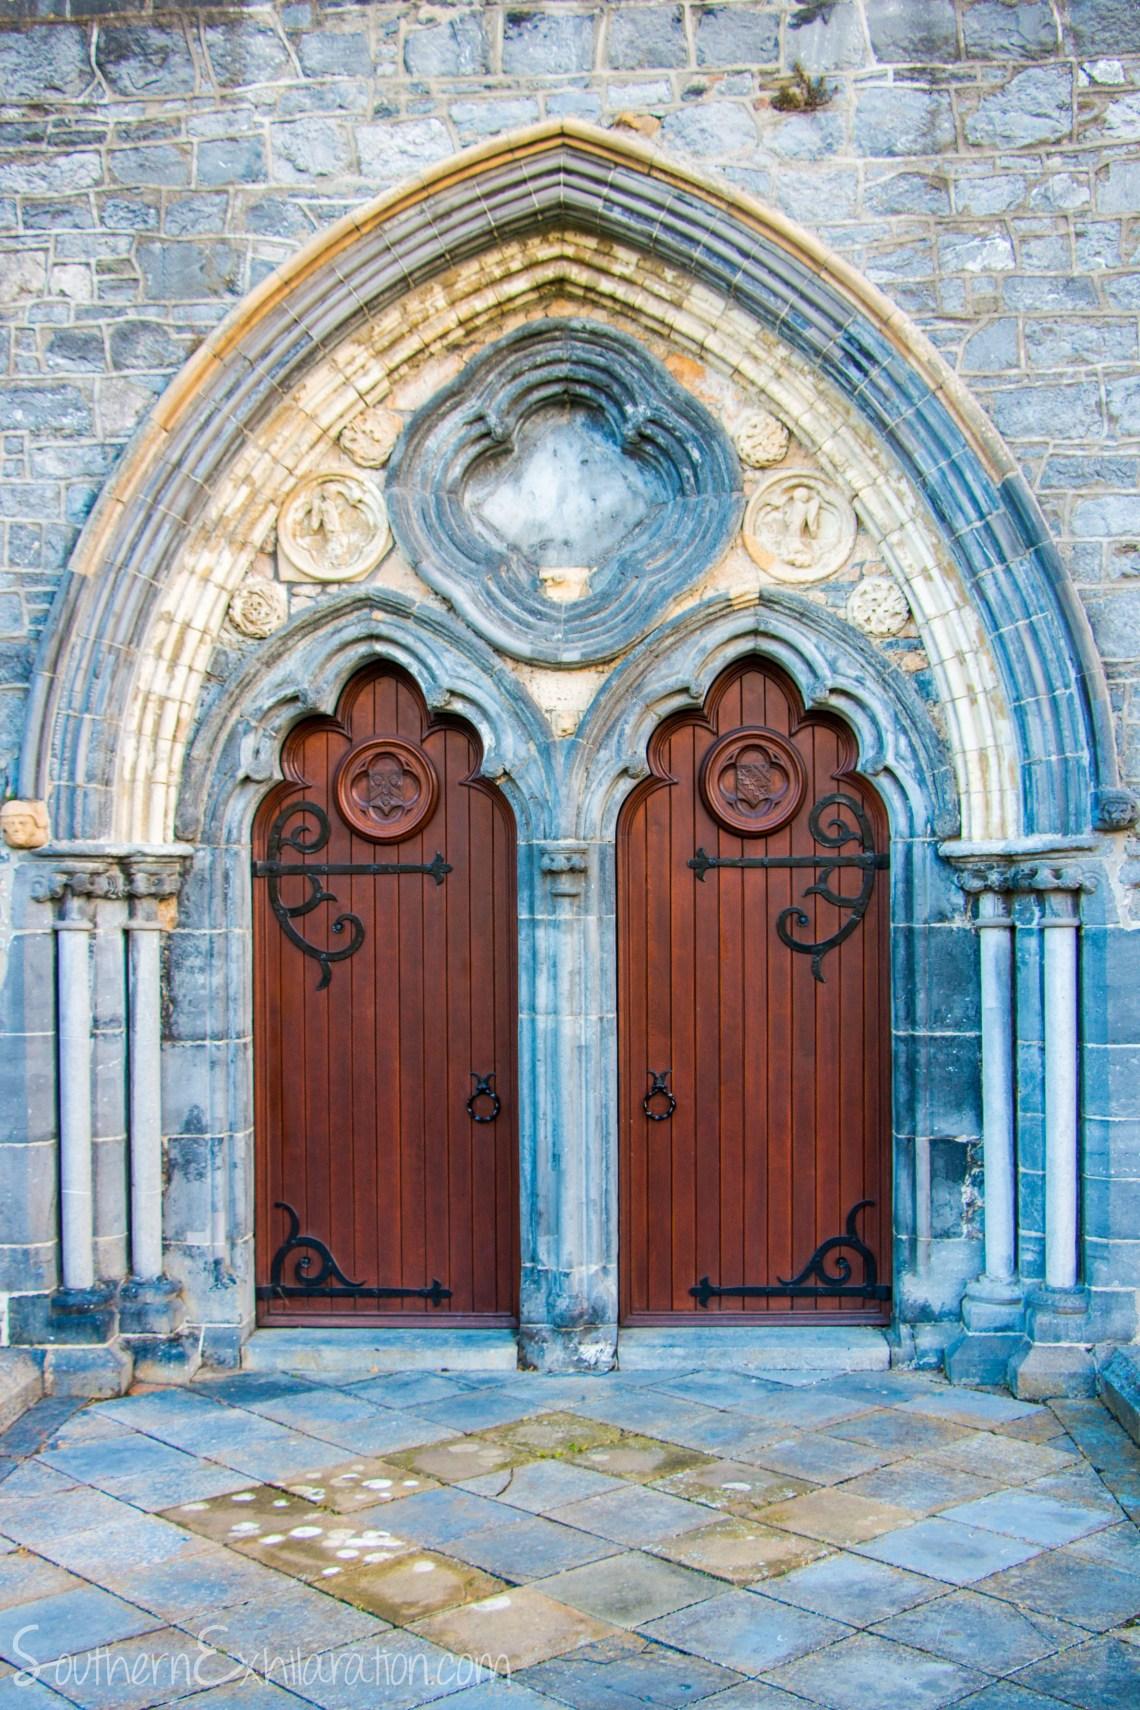 St. Canice's Cathedral | Kilkenny, Ireland